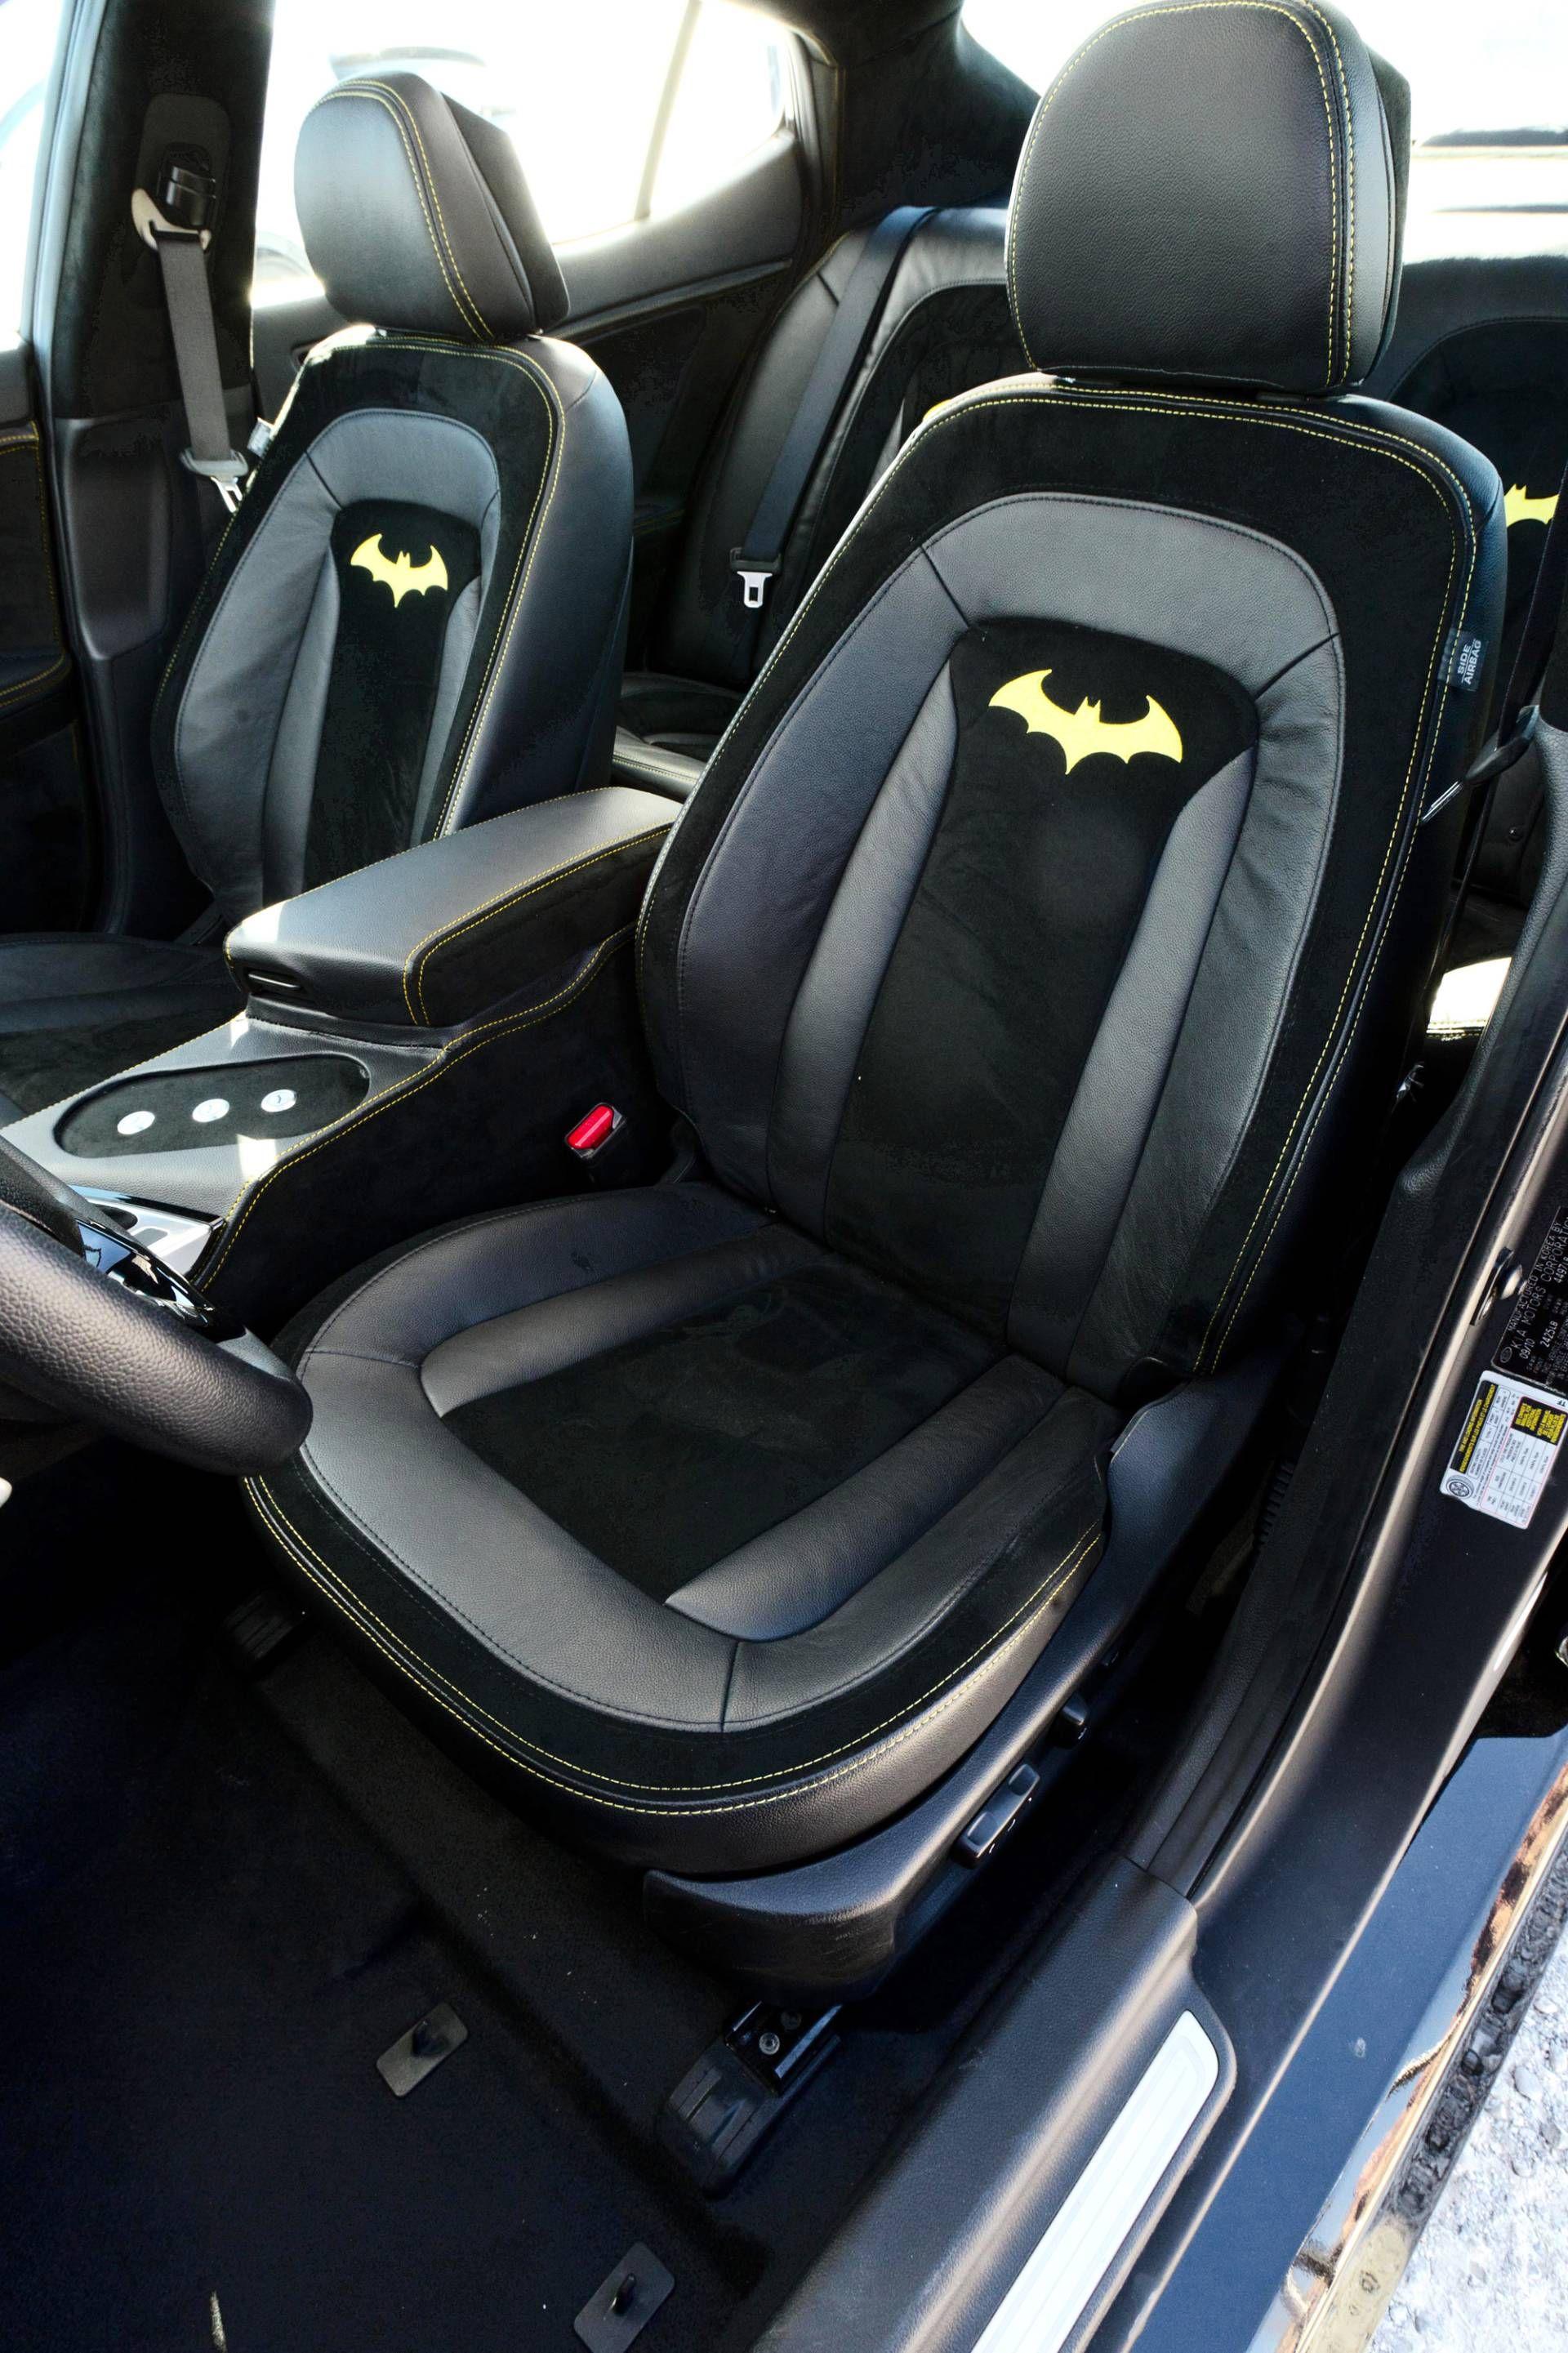 batman car chair mid century chairs for sale 2013 kia google search pinterest